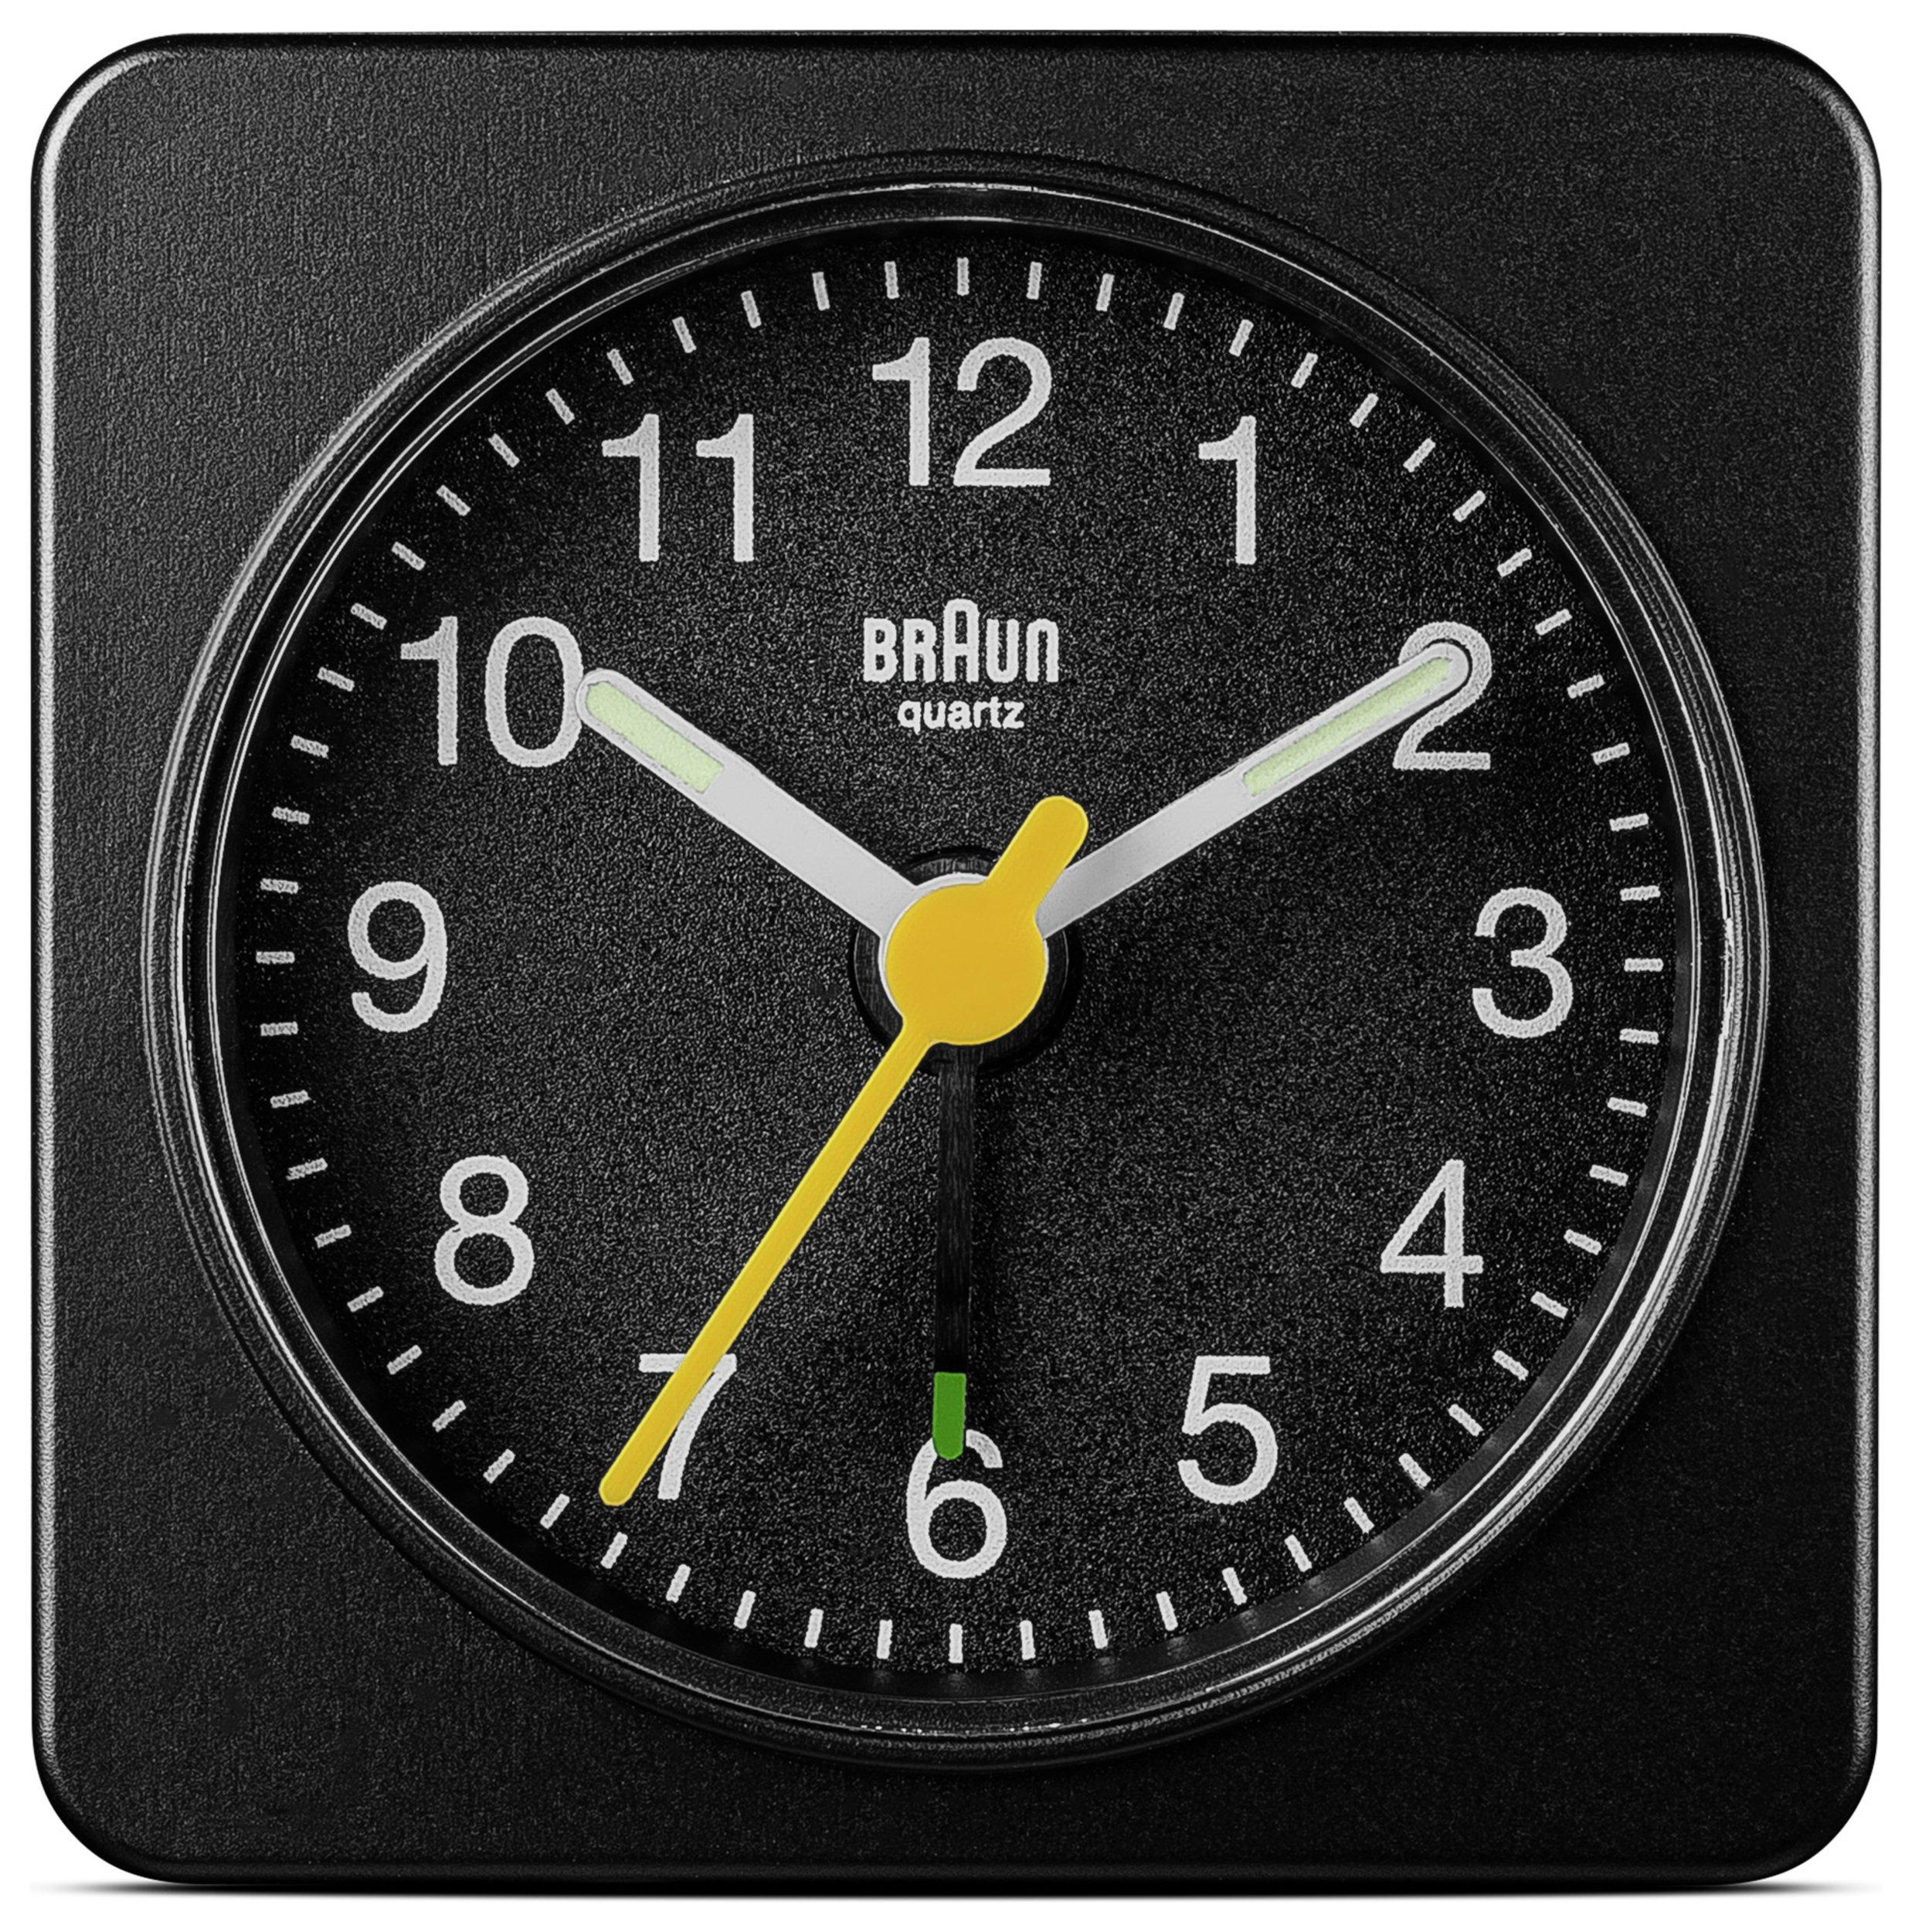 Braun Travel Alarm Clock - Black/White, £4.80 @ Argos - free c&c